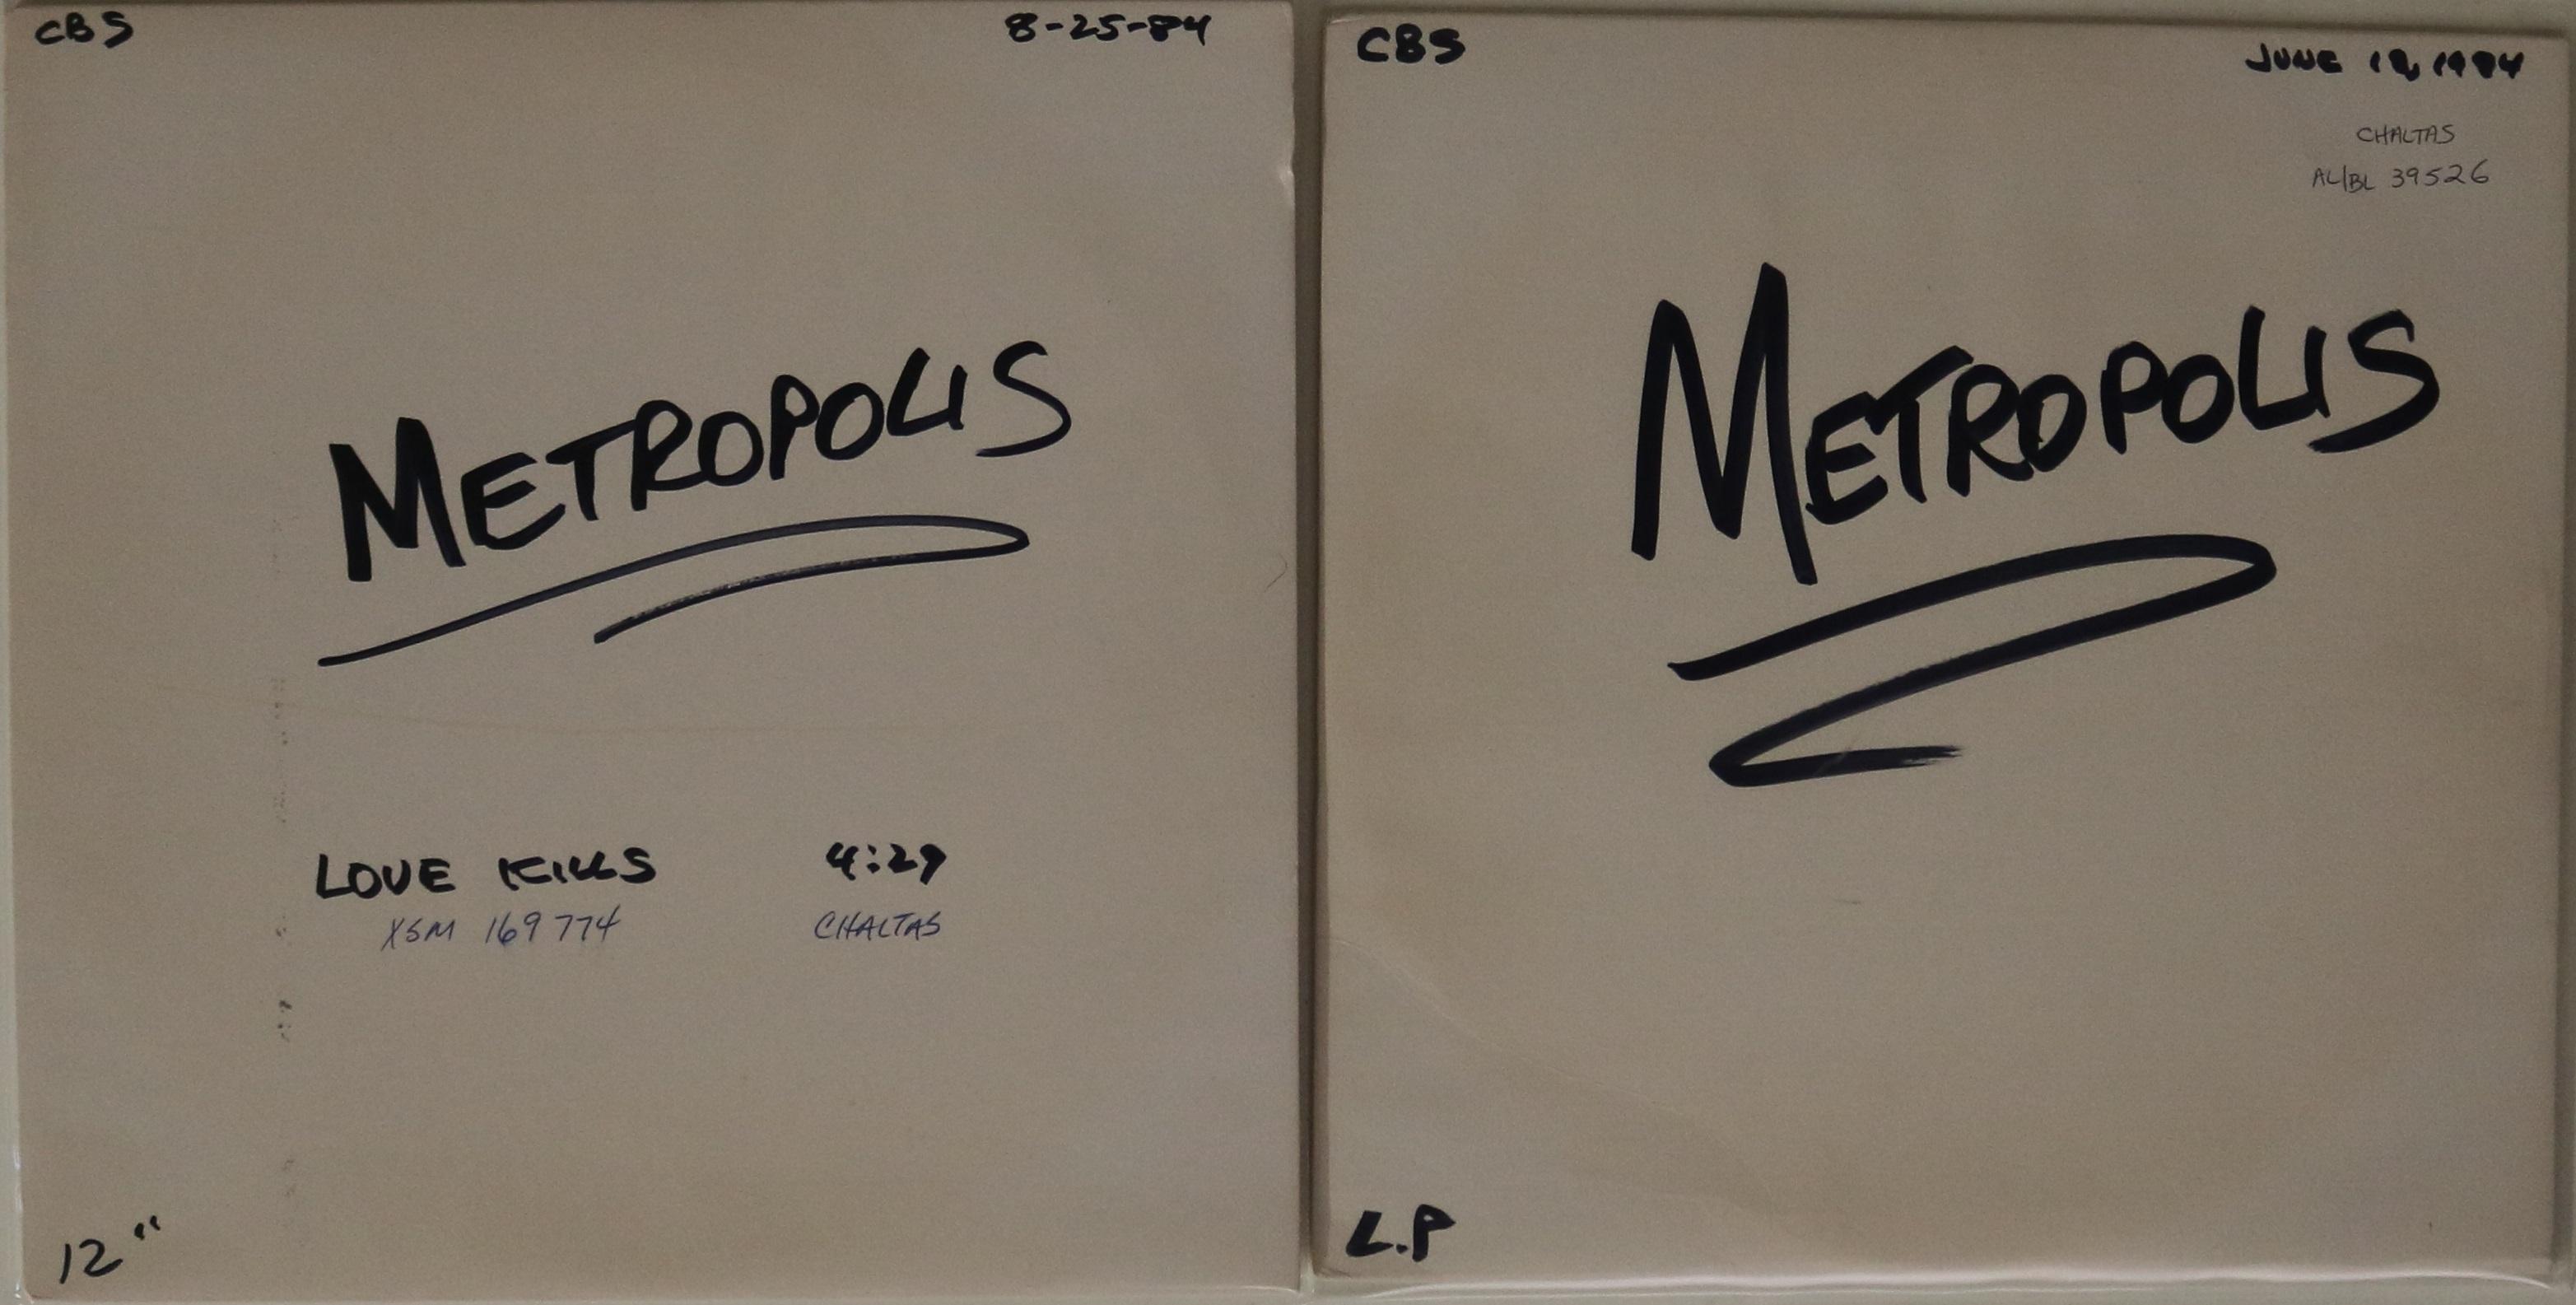 Lot 51 - FREDDIE MERCURY/METROPOLIS ACETATE RECORDINGS - Extremely unusual and very unlikely to seen again